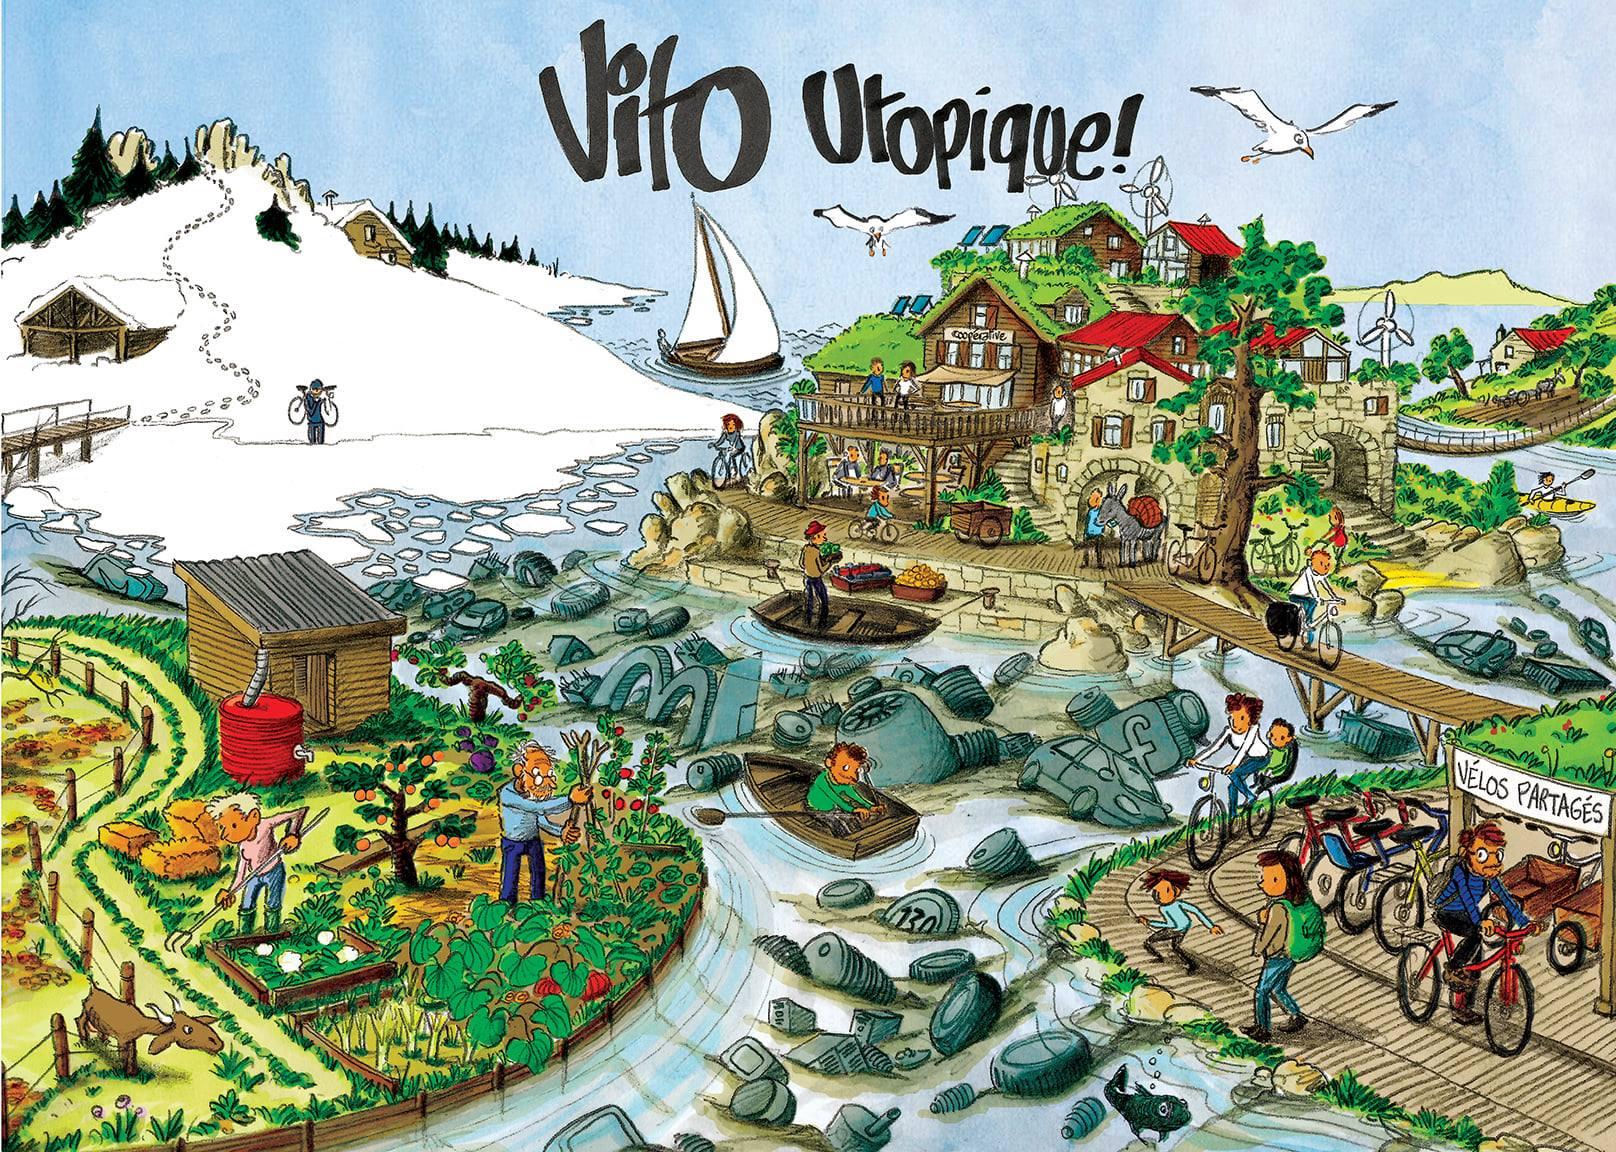 Vito-utopique